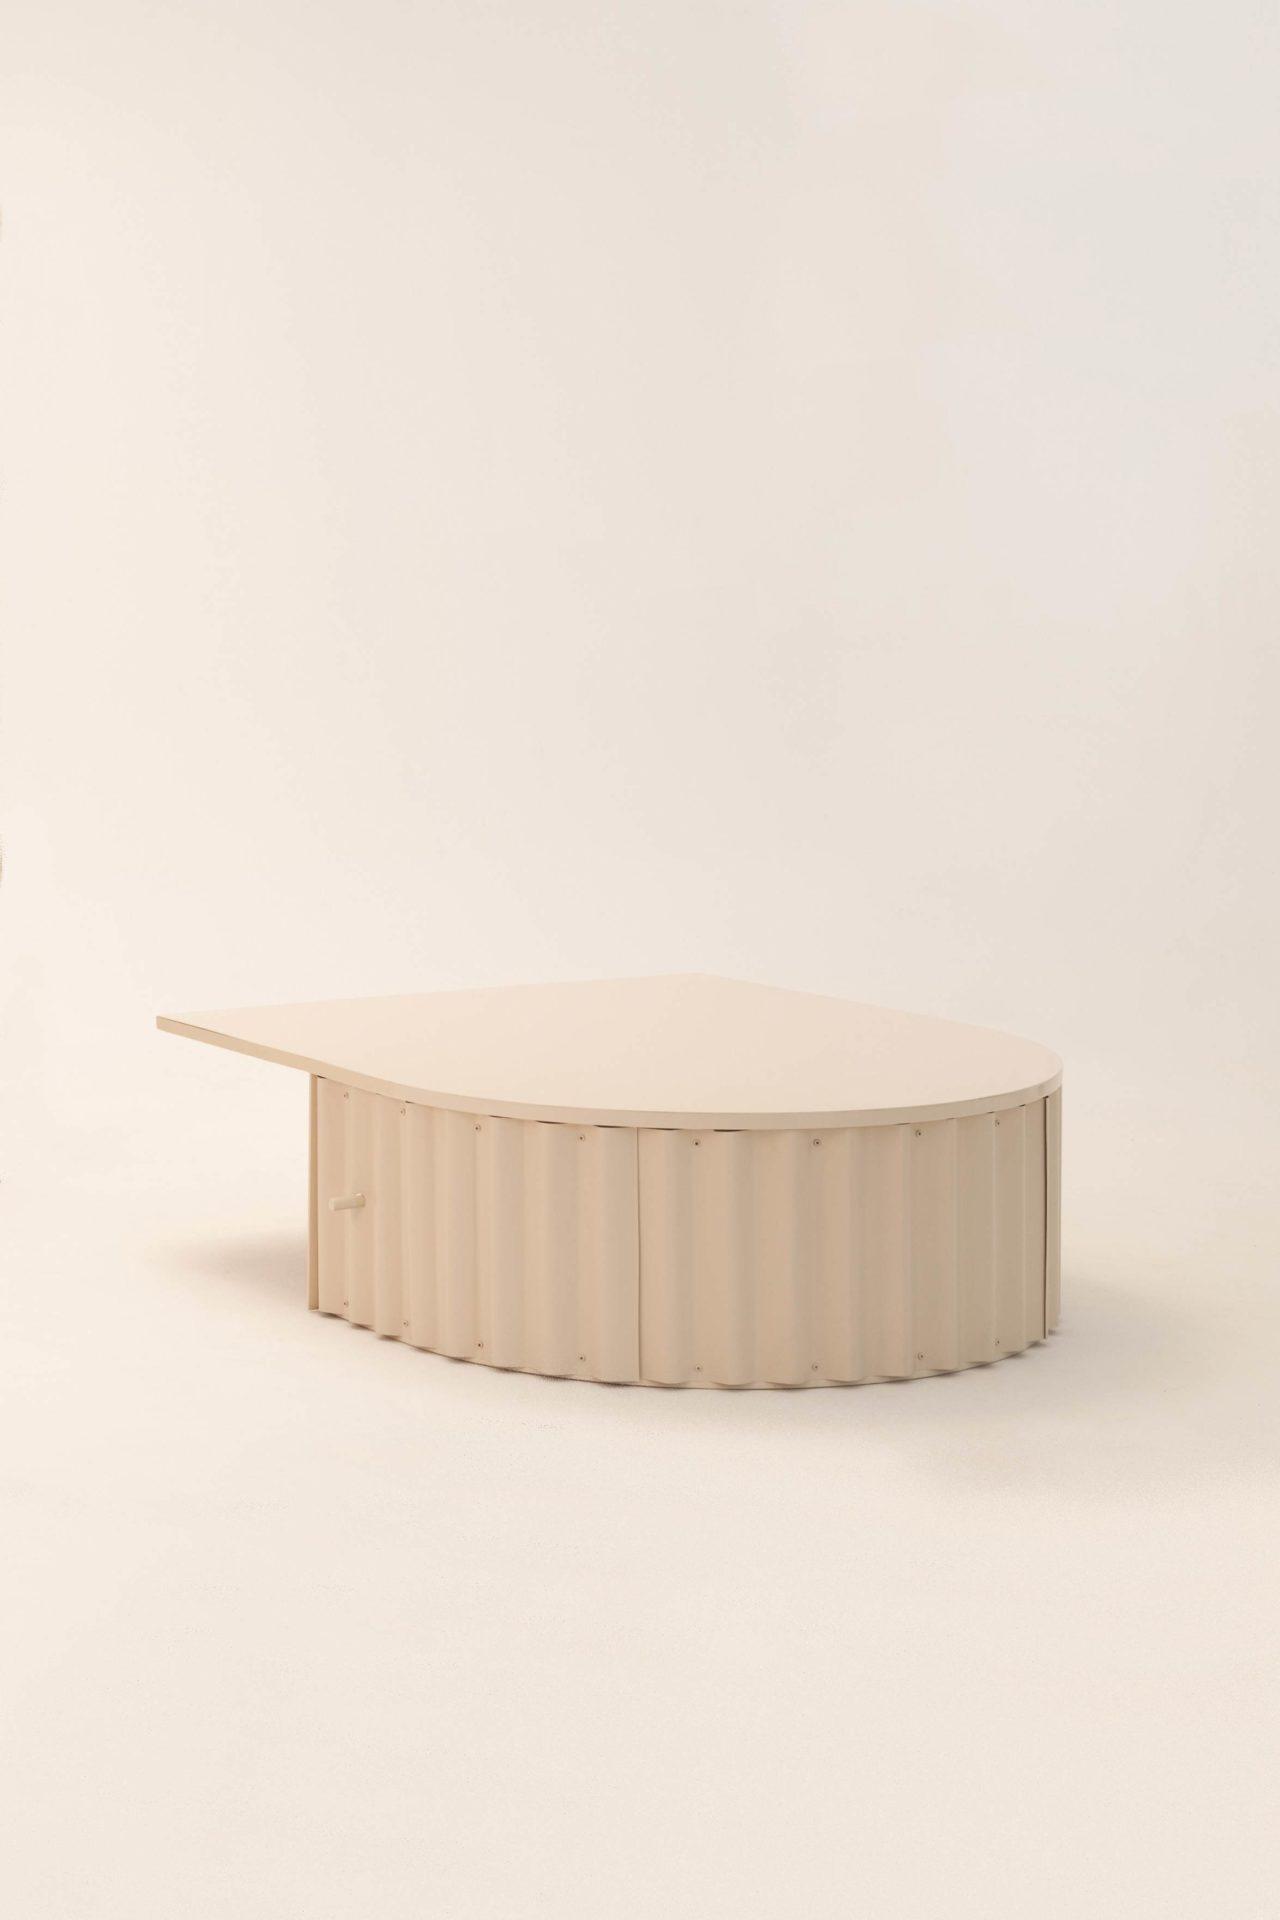 Table Ondula